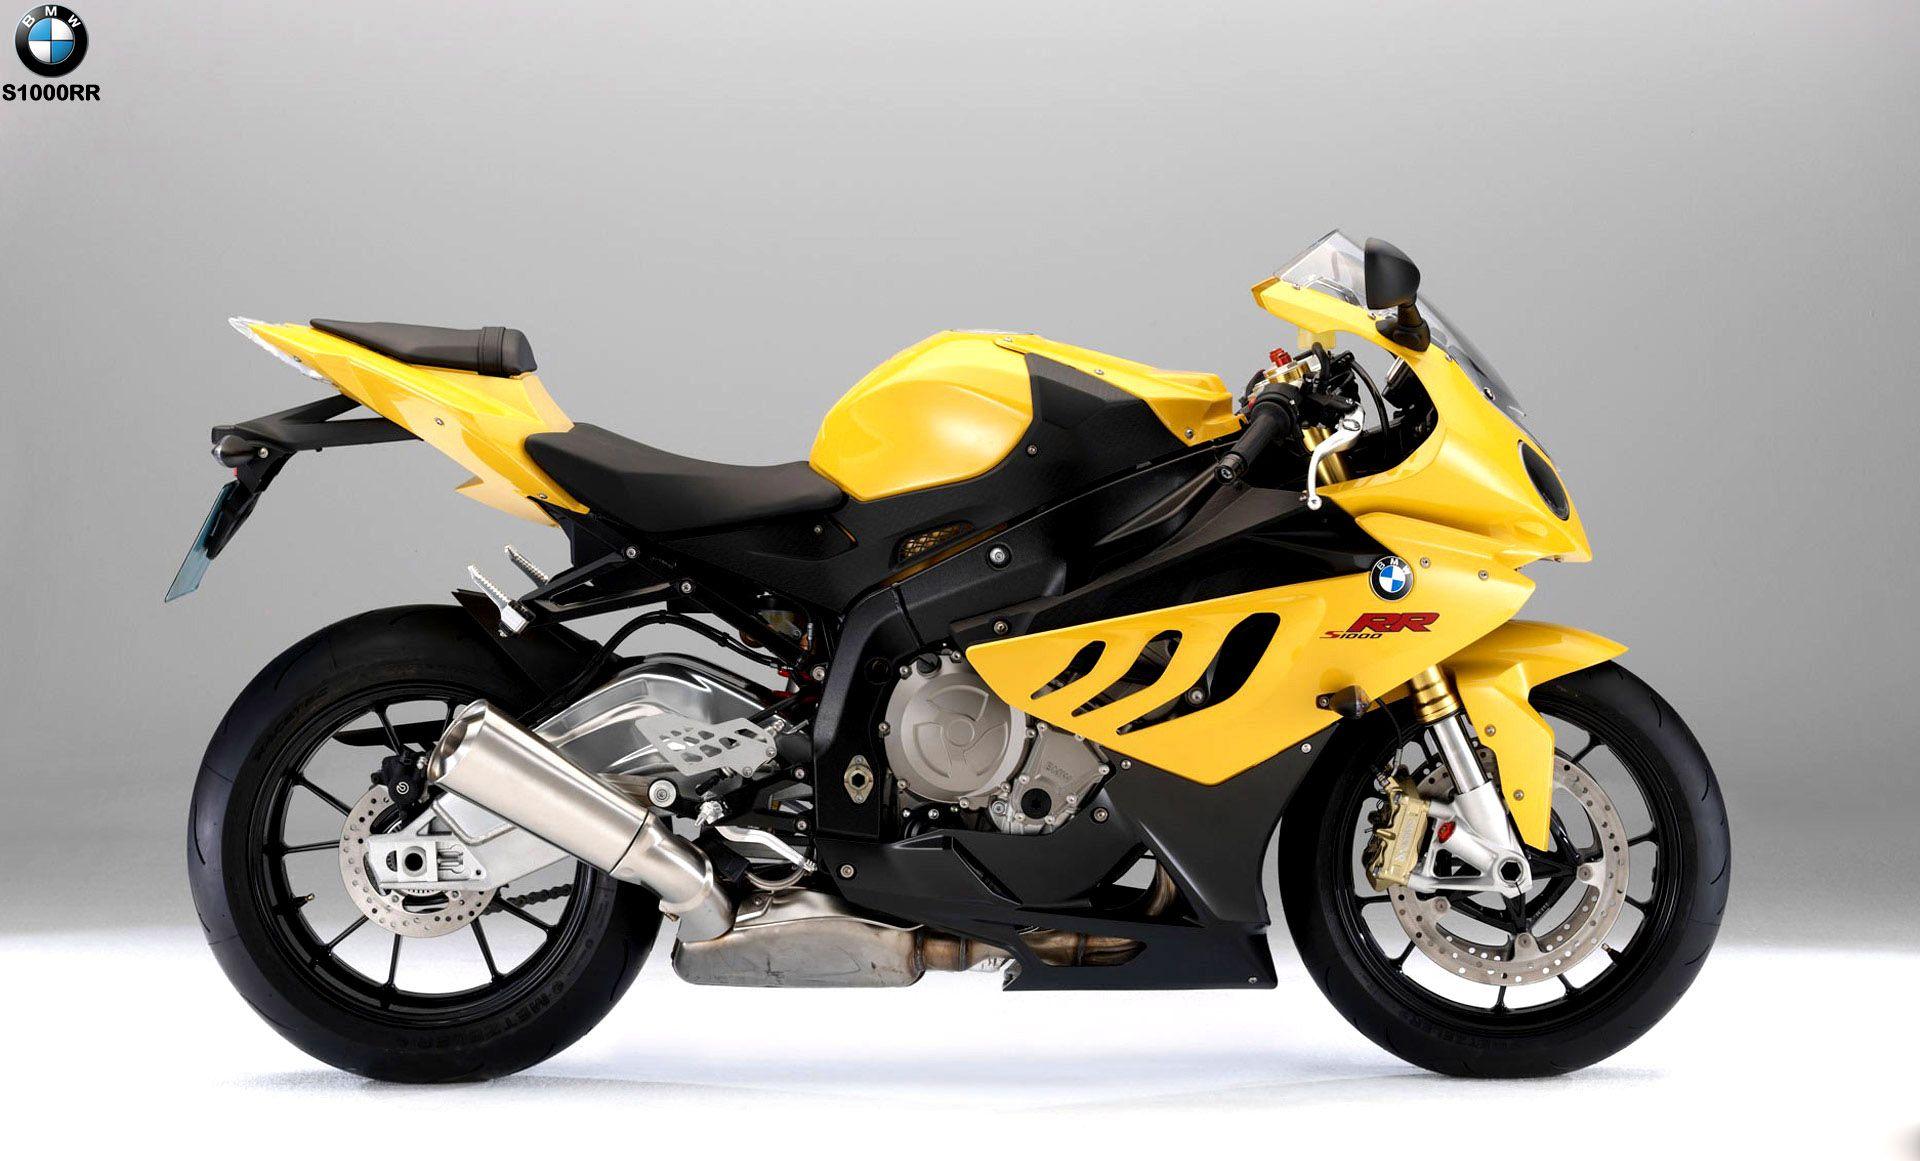 Stylish Yellow Bmw S1000rr Hd Photos Wallpaper Bmw Motorrad Bmw